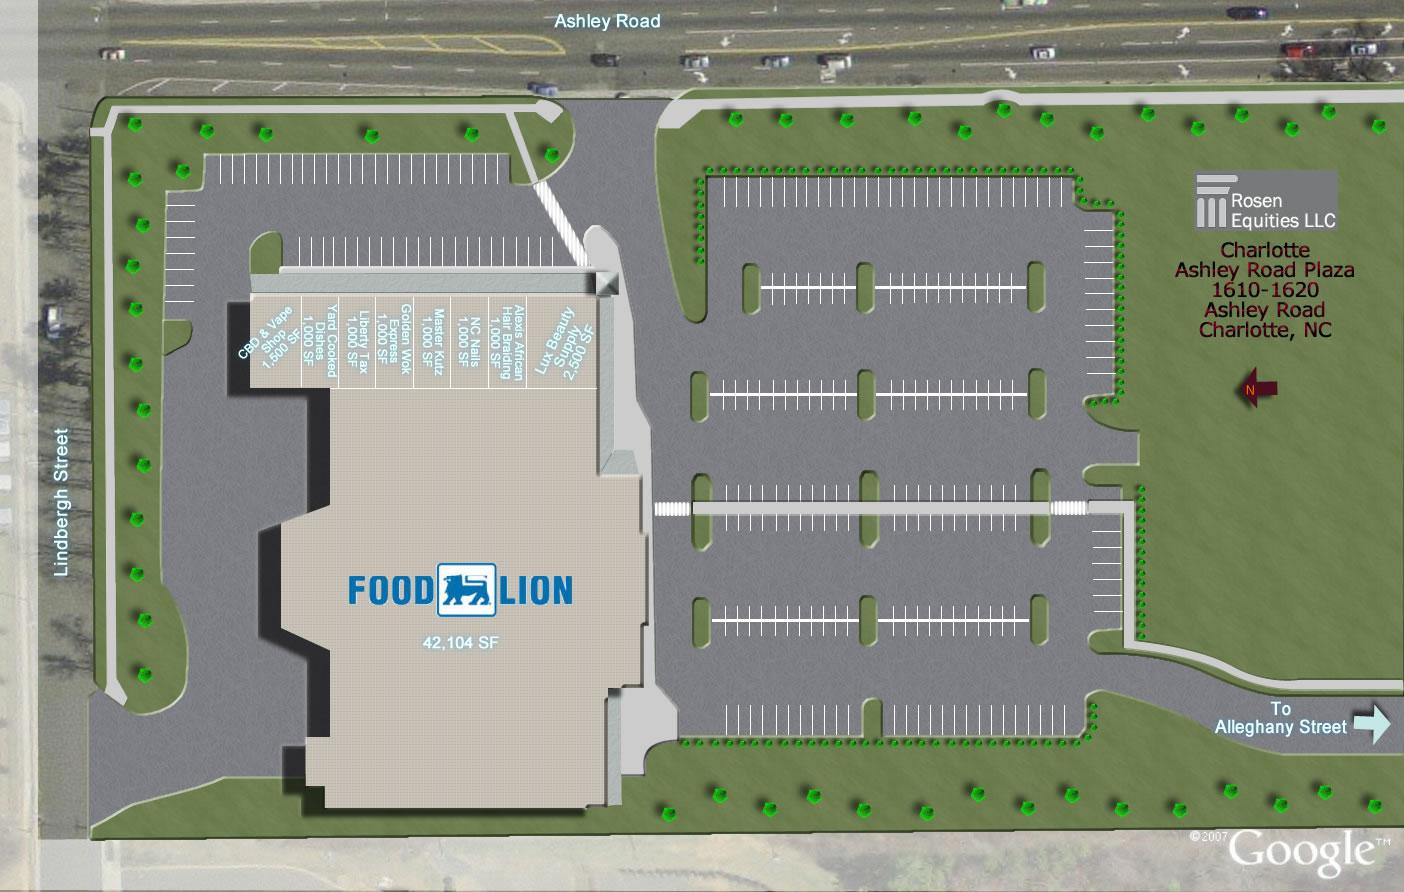 Ashley Road Plaza Siteplan